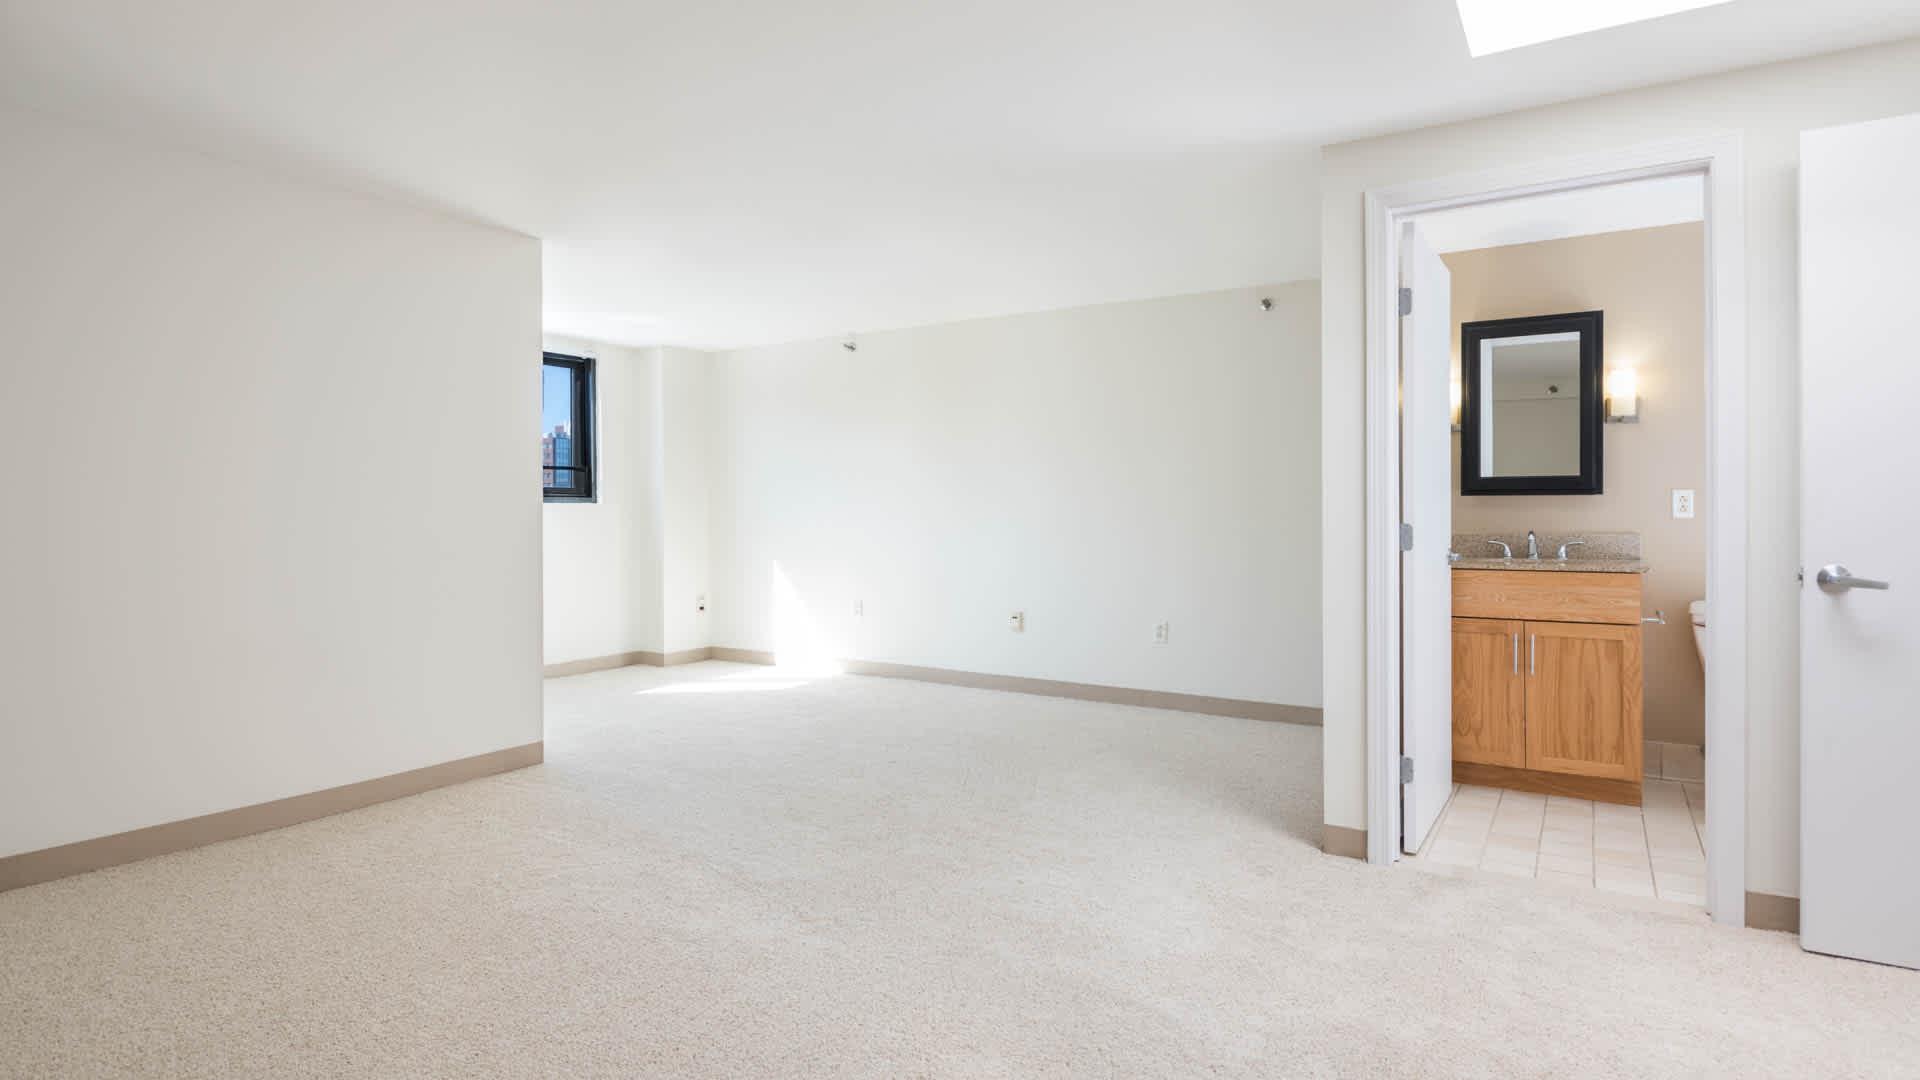 Lofts at kendall square apartments bedroom